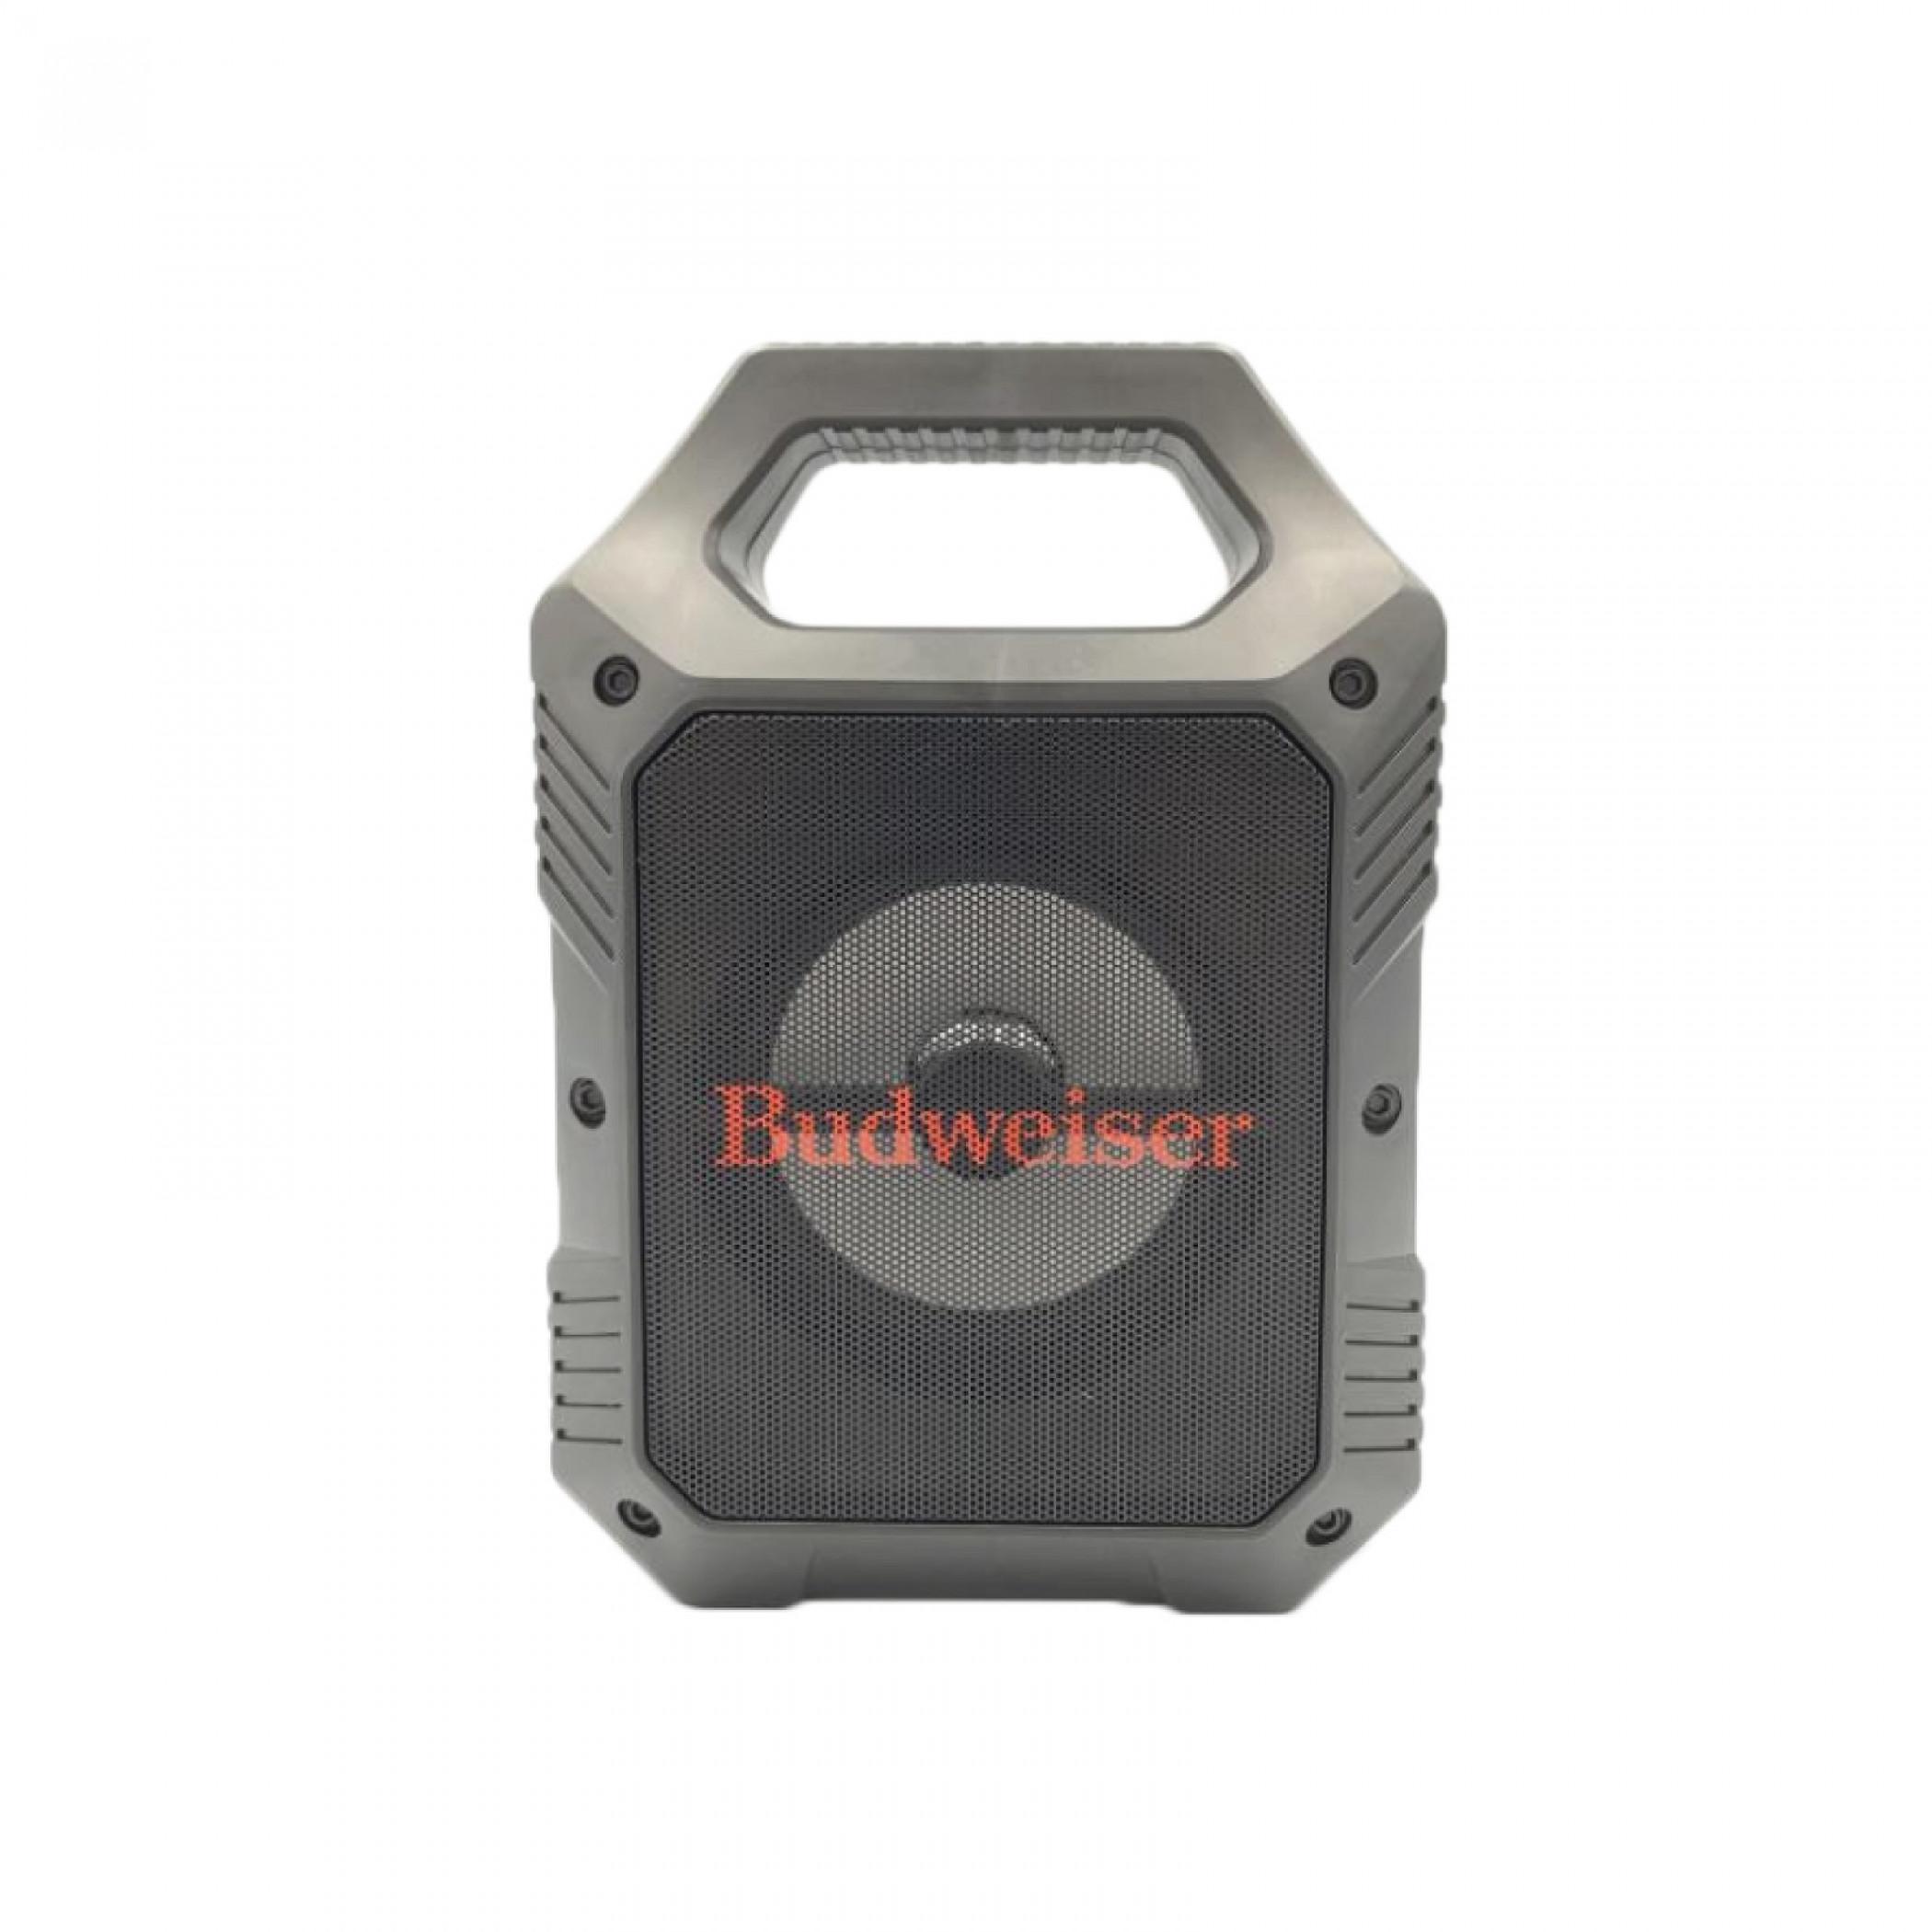 "Budweiser 9"" Rugged Tailgate LED Bluetooth Speaker"